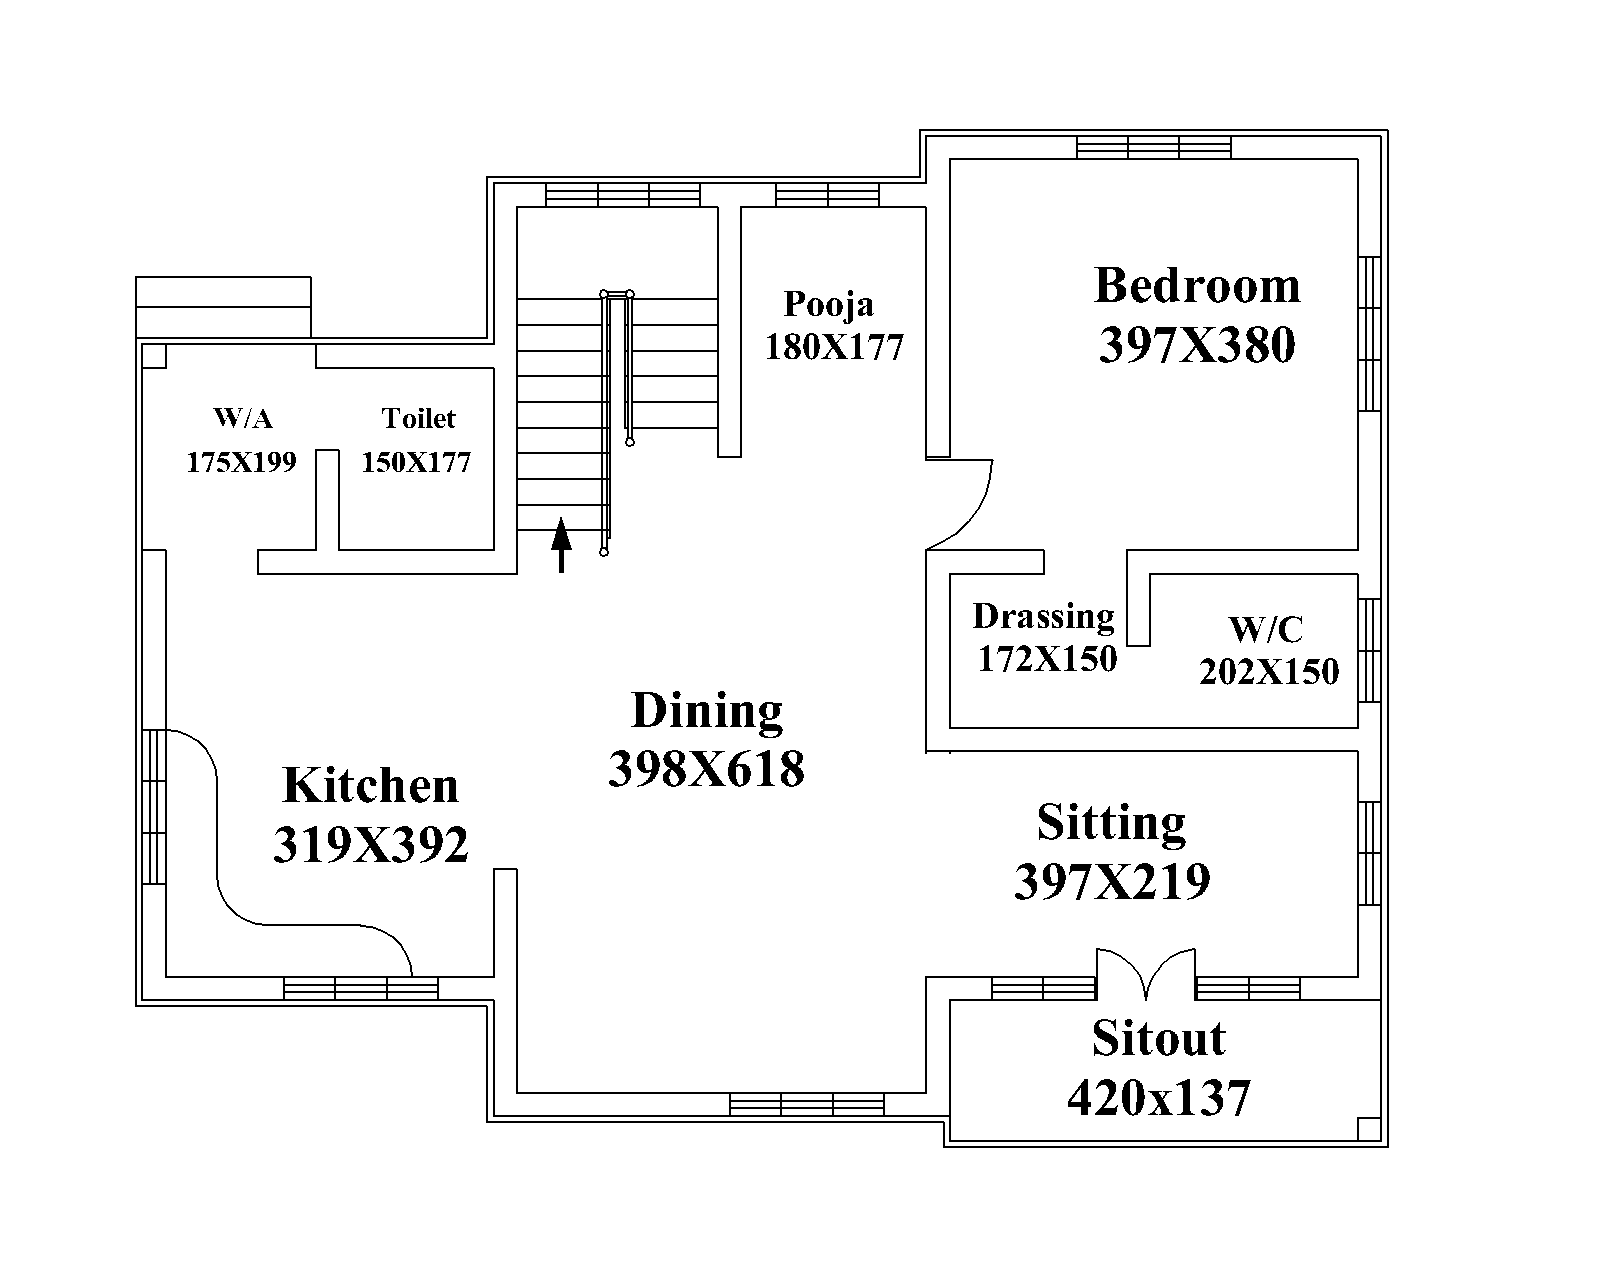 4 Bedroom Kerala House Plans | Bedroom Furniture High ...